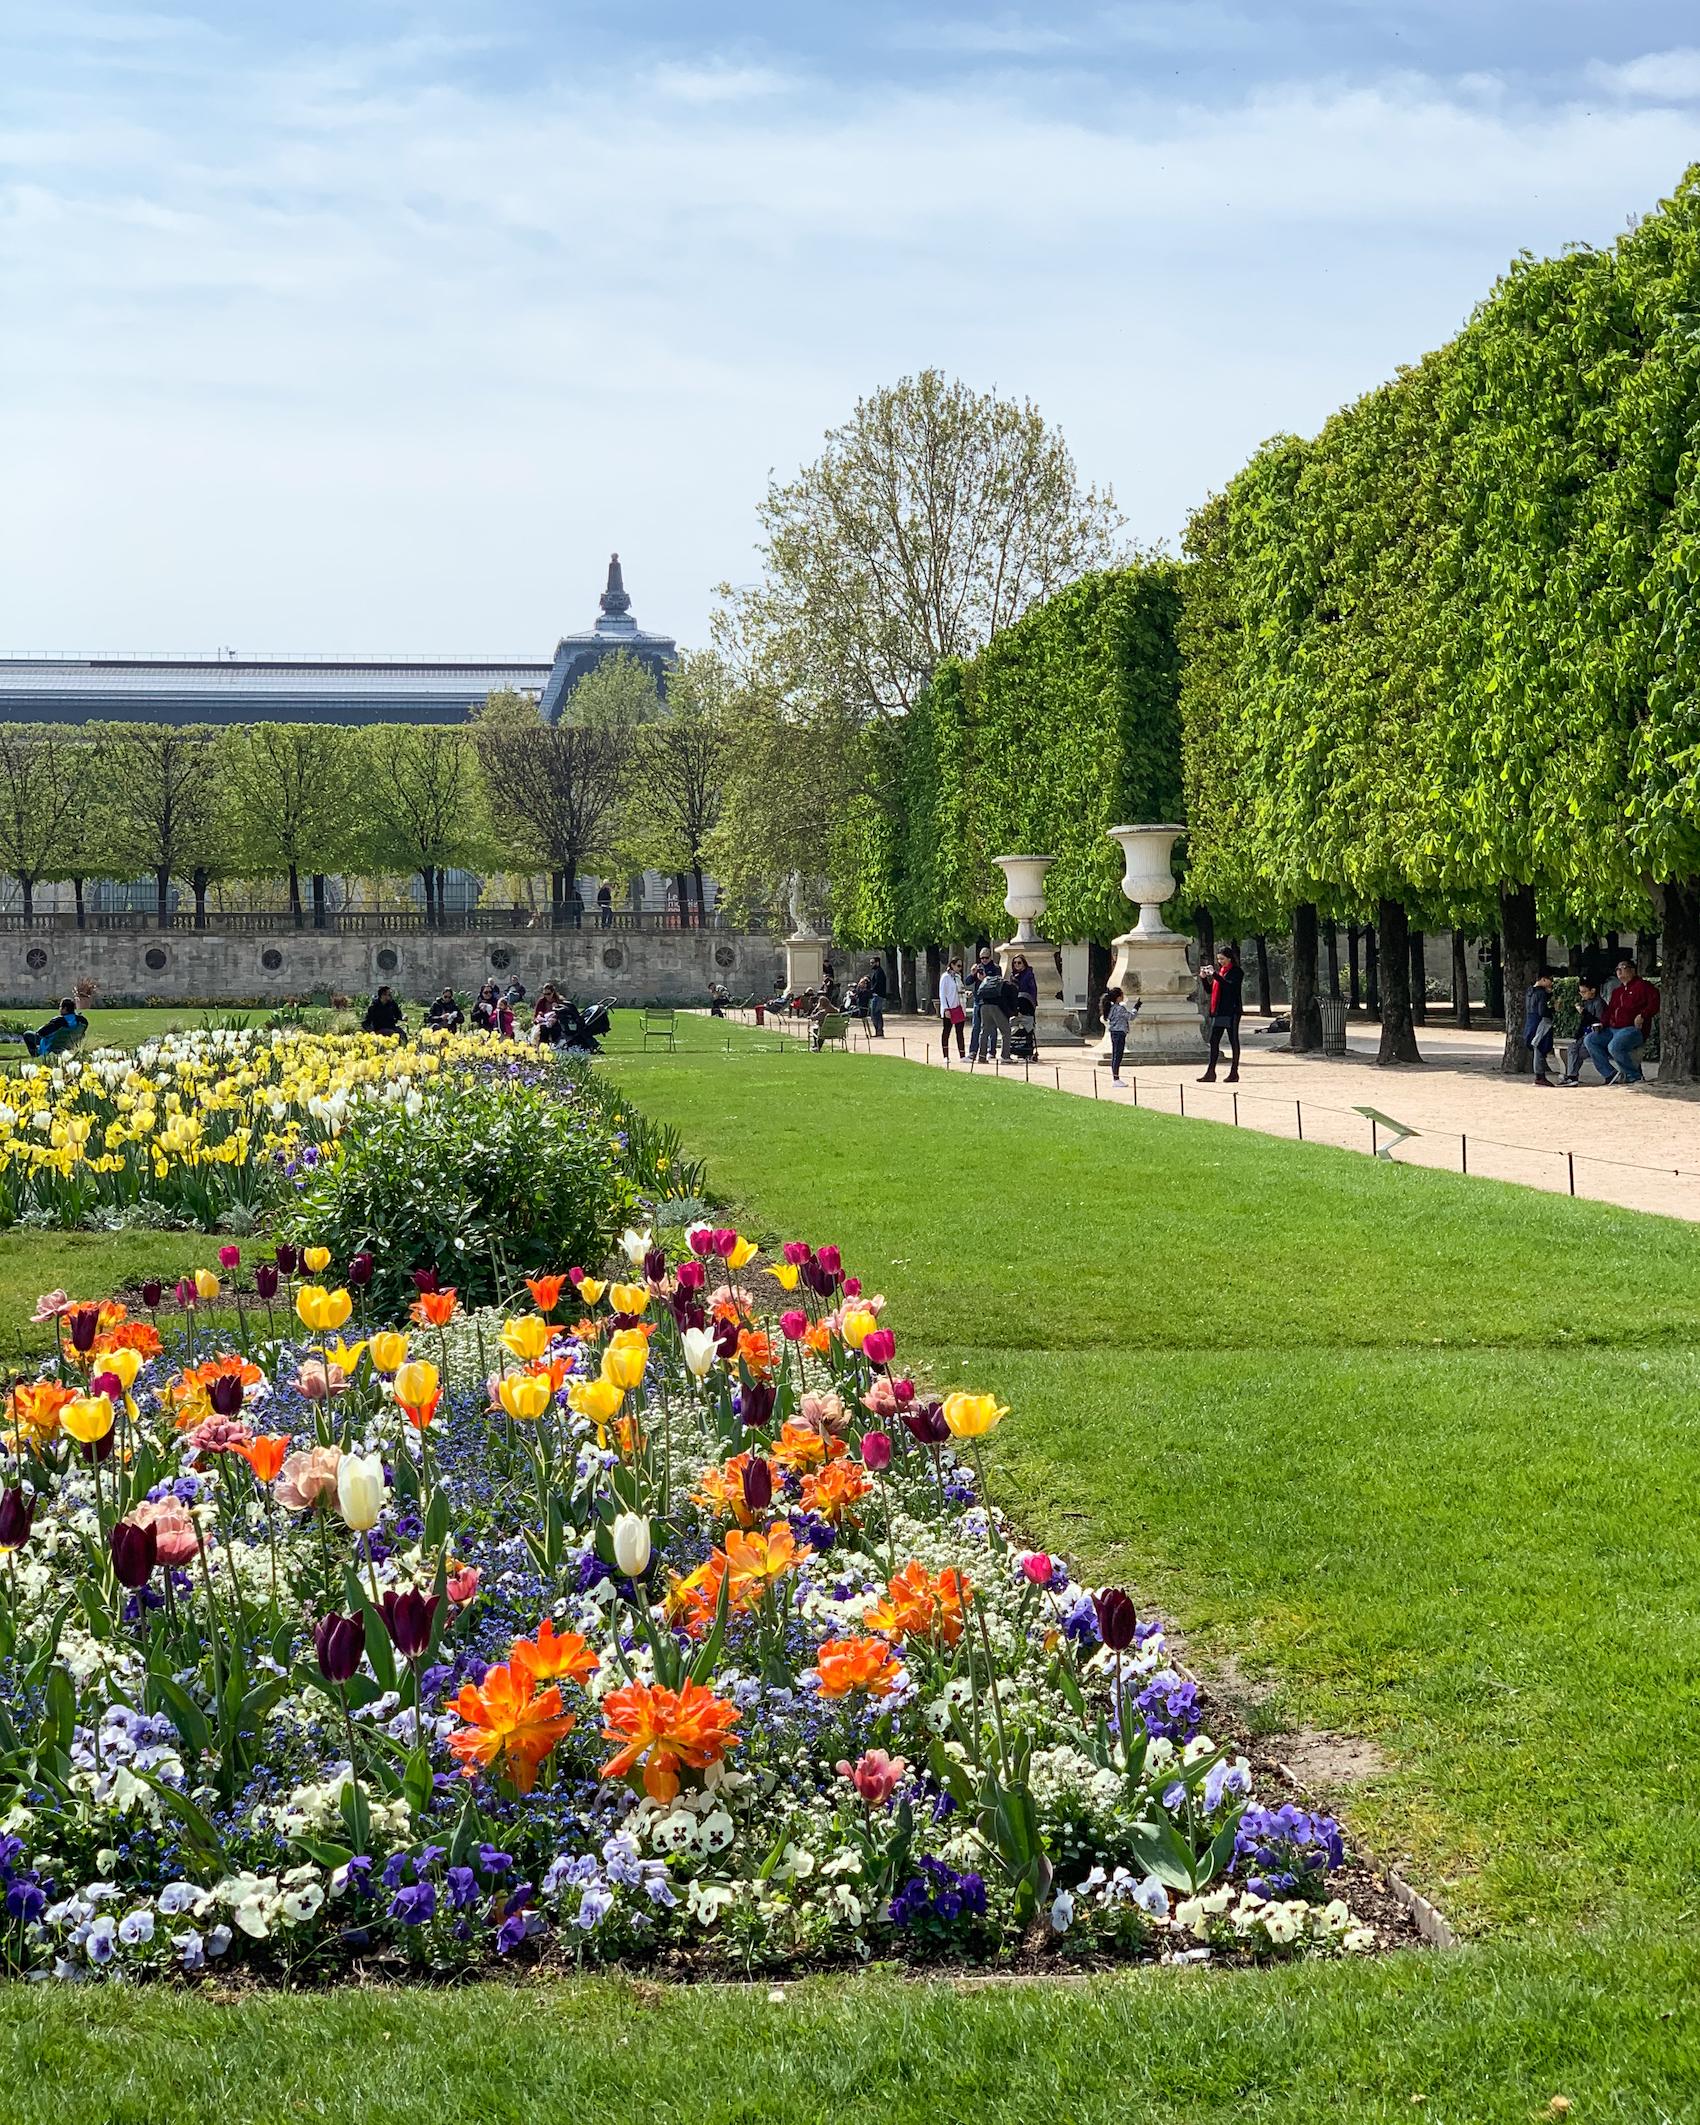 Spring flower beds in Paris